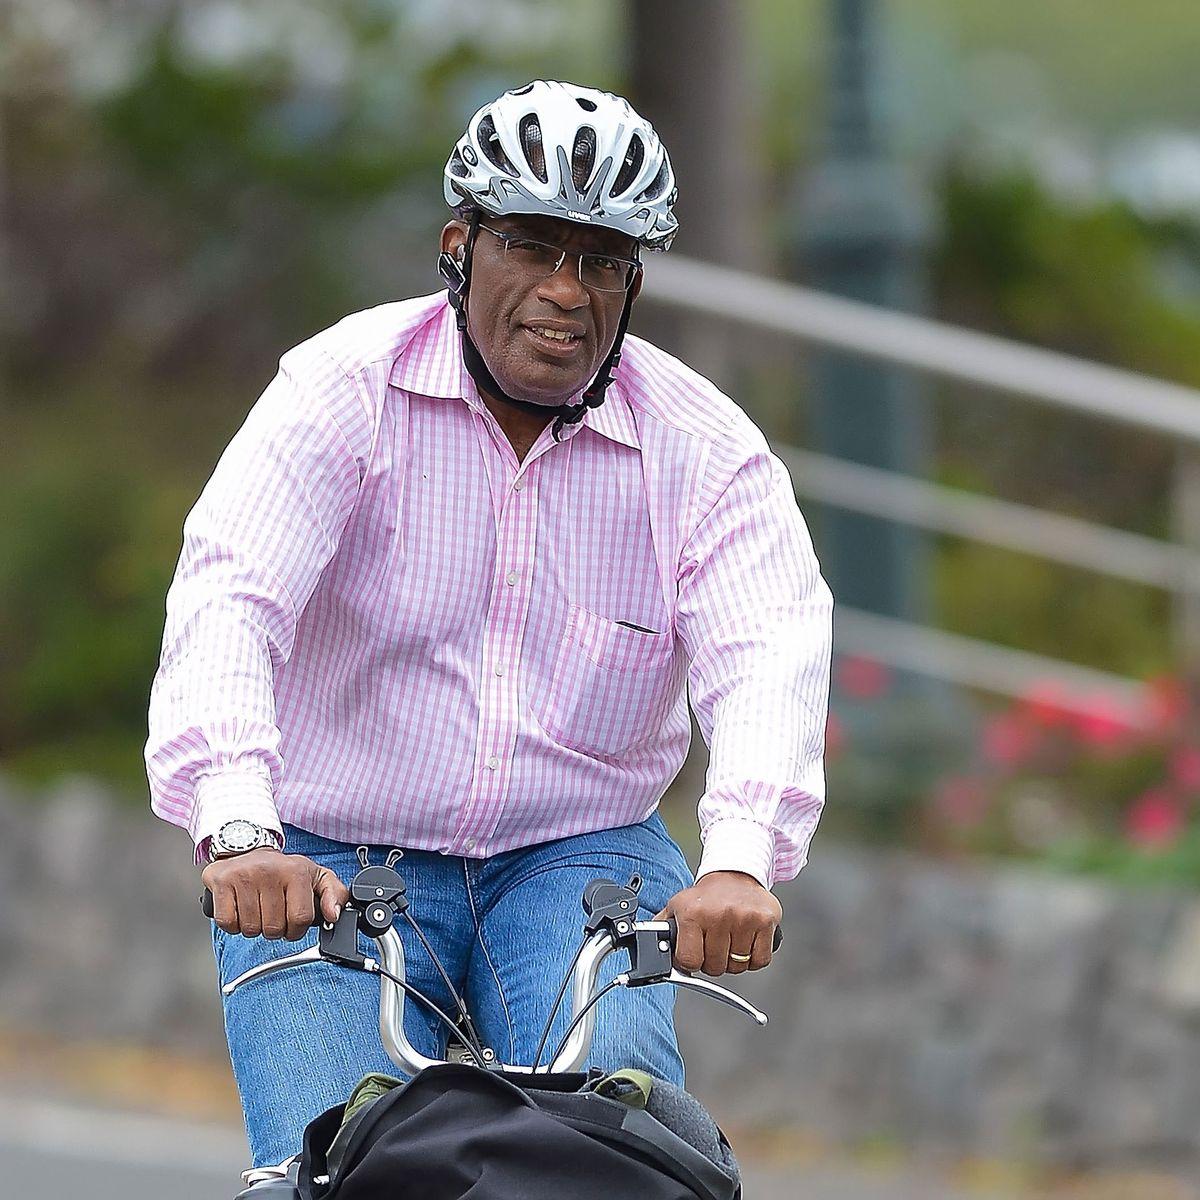 Visor Cap UV Protection Bike Riding Adults Bicycle Cycling Headwear Sun Hat